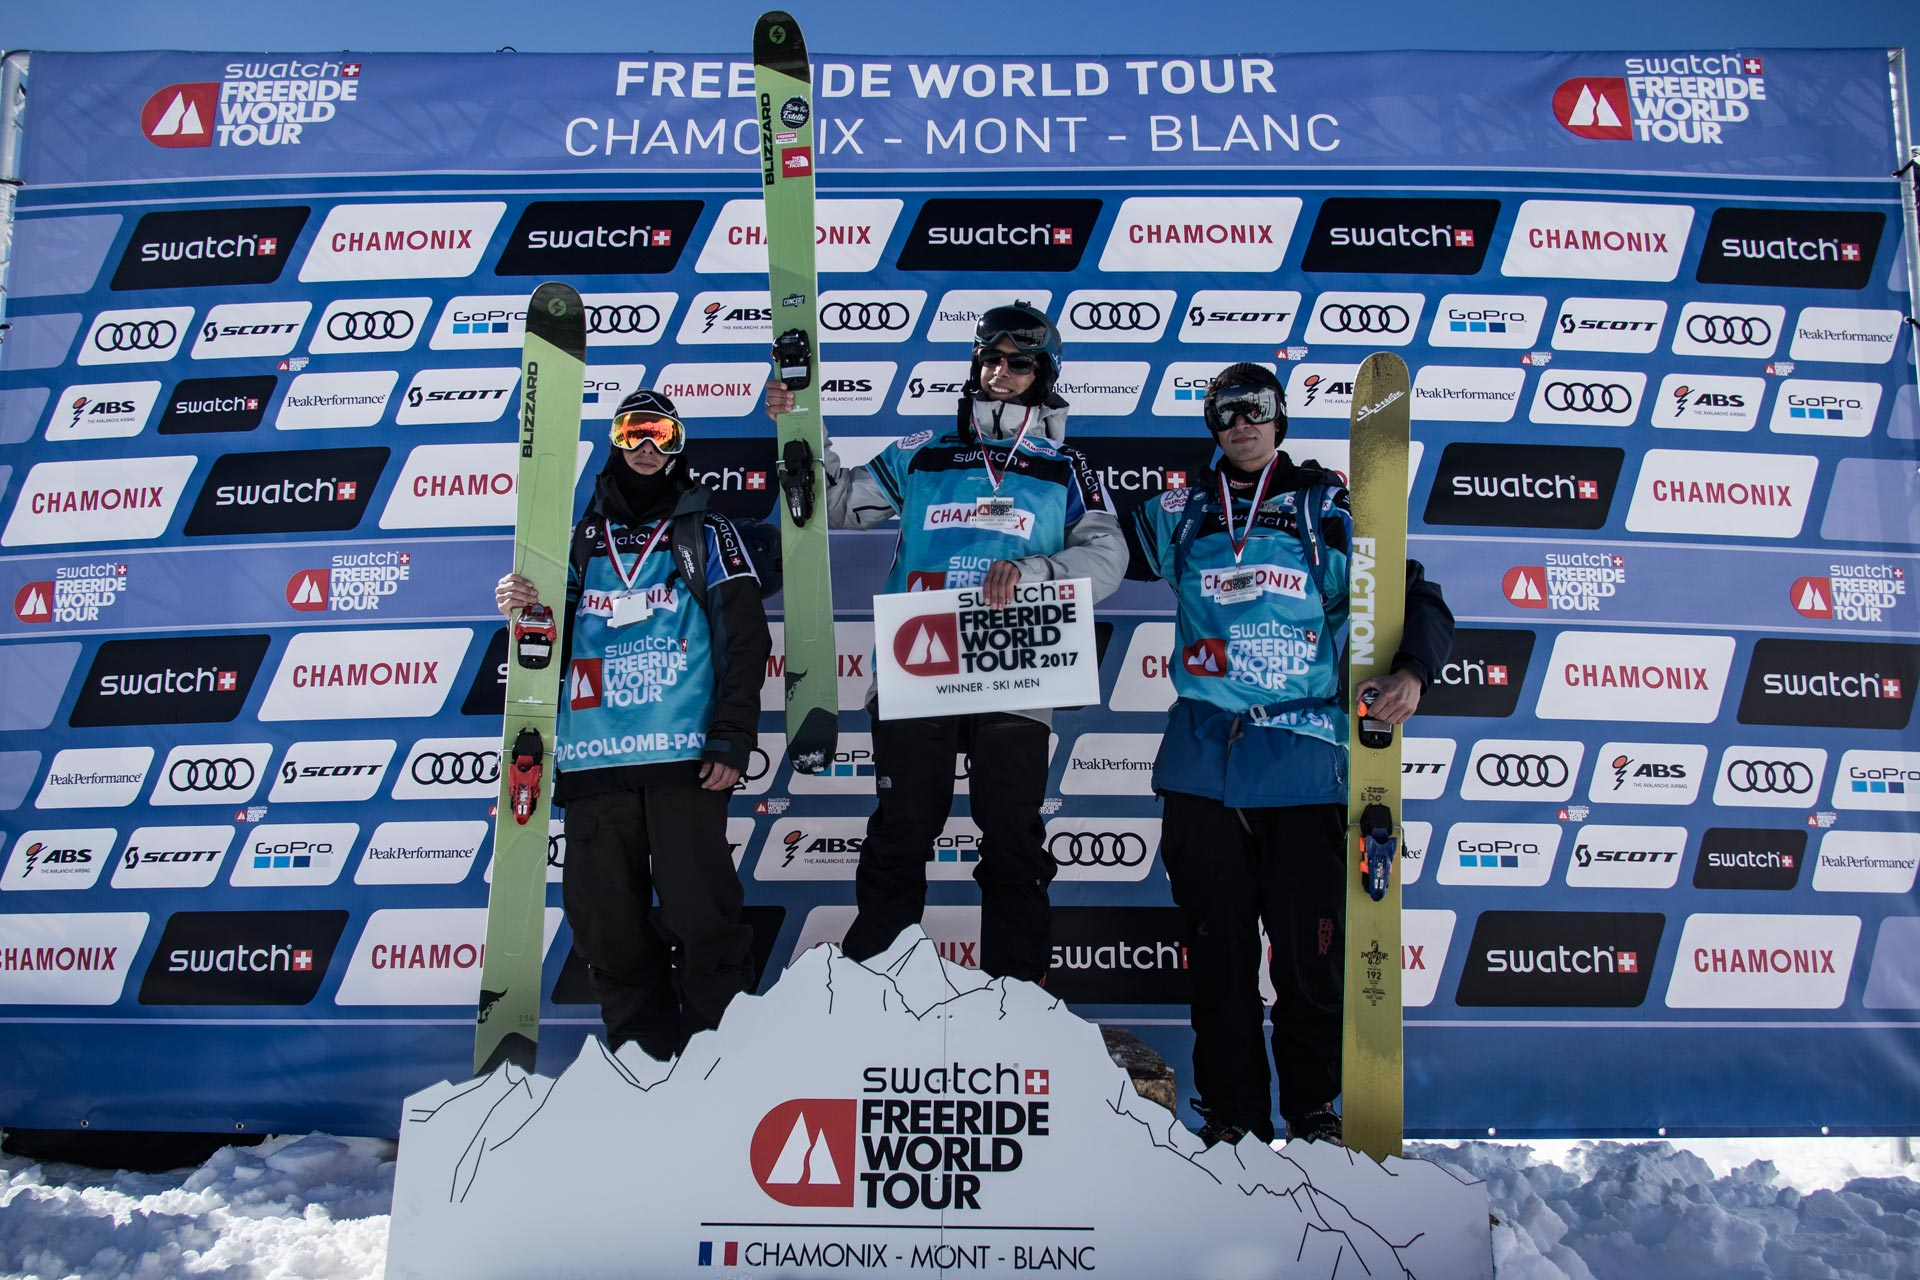 Die Top 3 Men in Andorra (Nachholcontest aus Chamonix): Loic Collomb-Patton (FRA), Léo Slemett (FRA) und Yann Rausis (SUI) - Foto: freerideworldtour.com / D. Daher